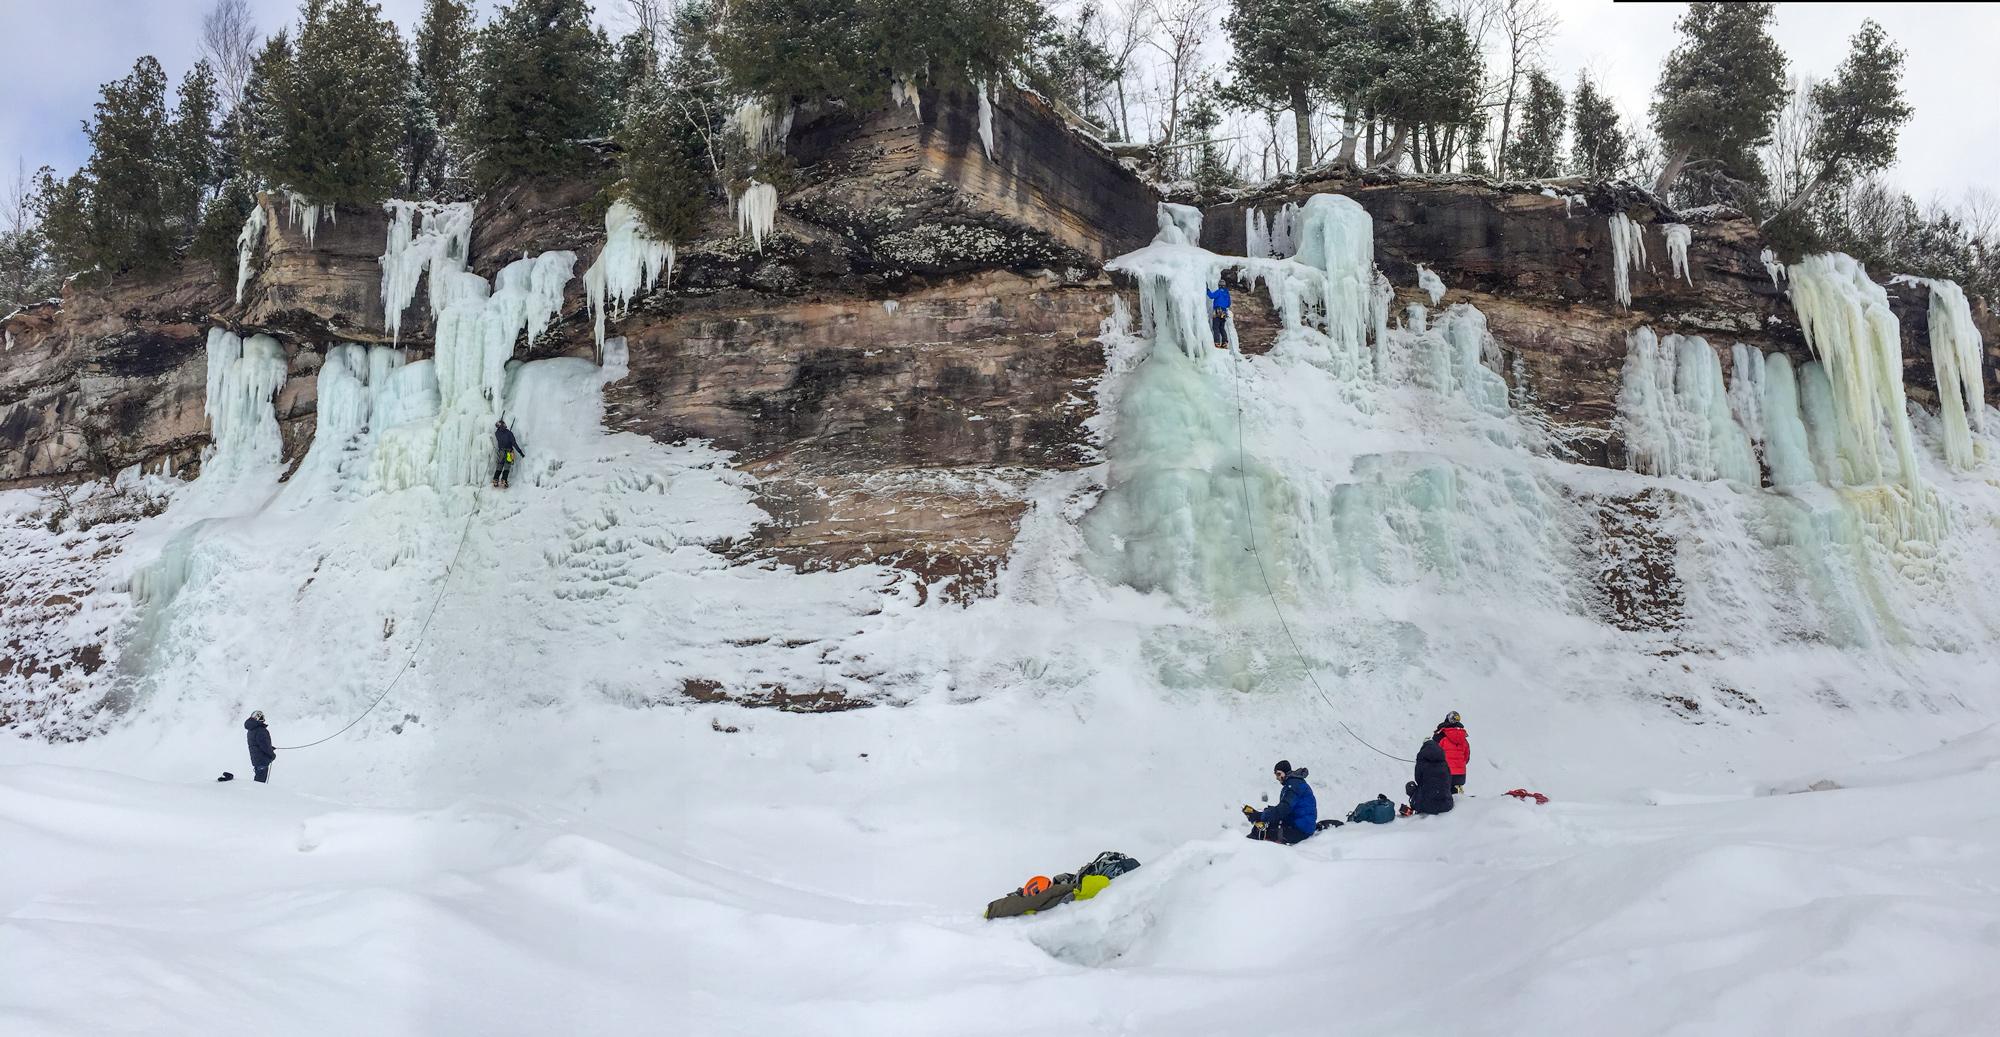 ice-climbing-grand-island-michigan-wilkinson3.jpg